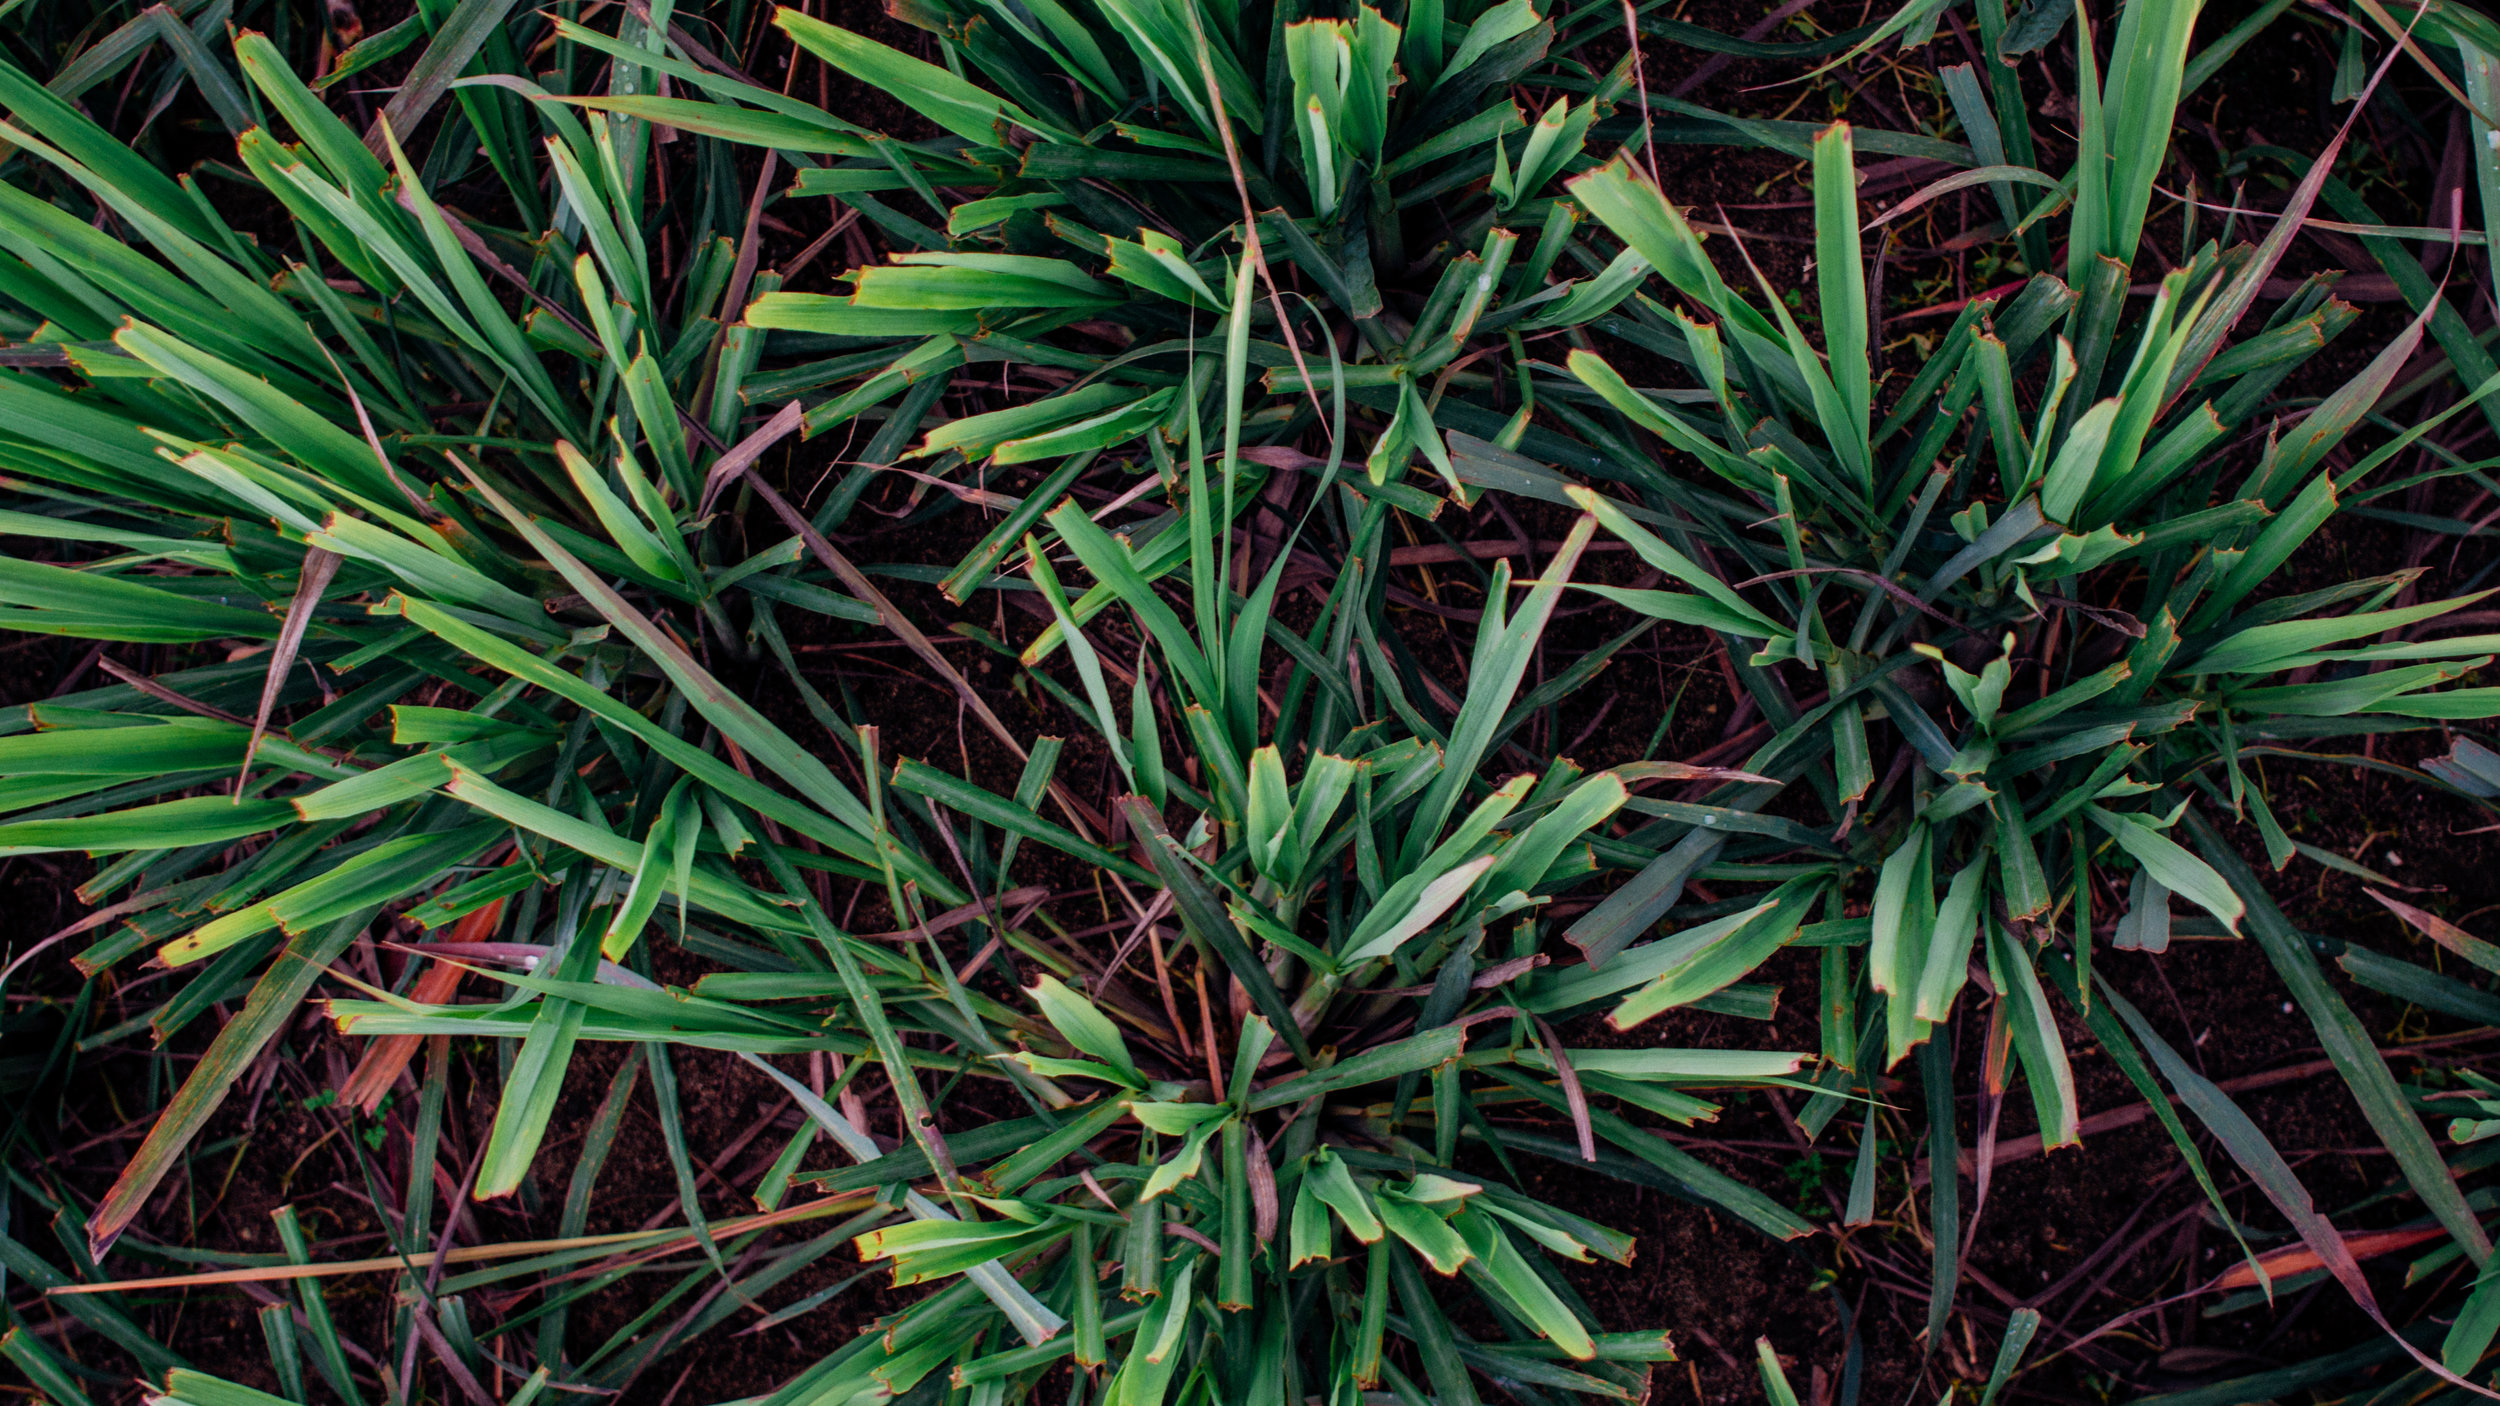 psf_herbs-8.jpg